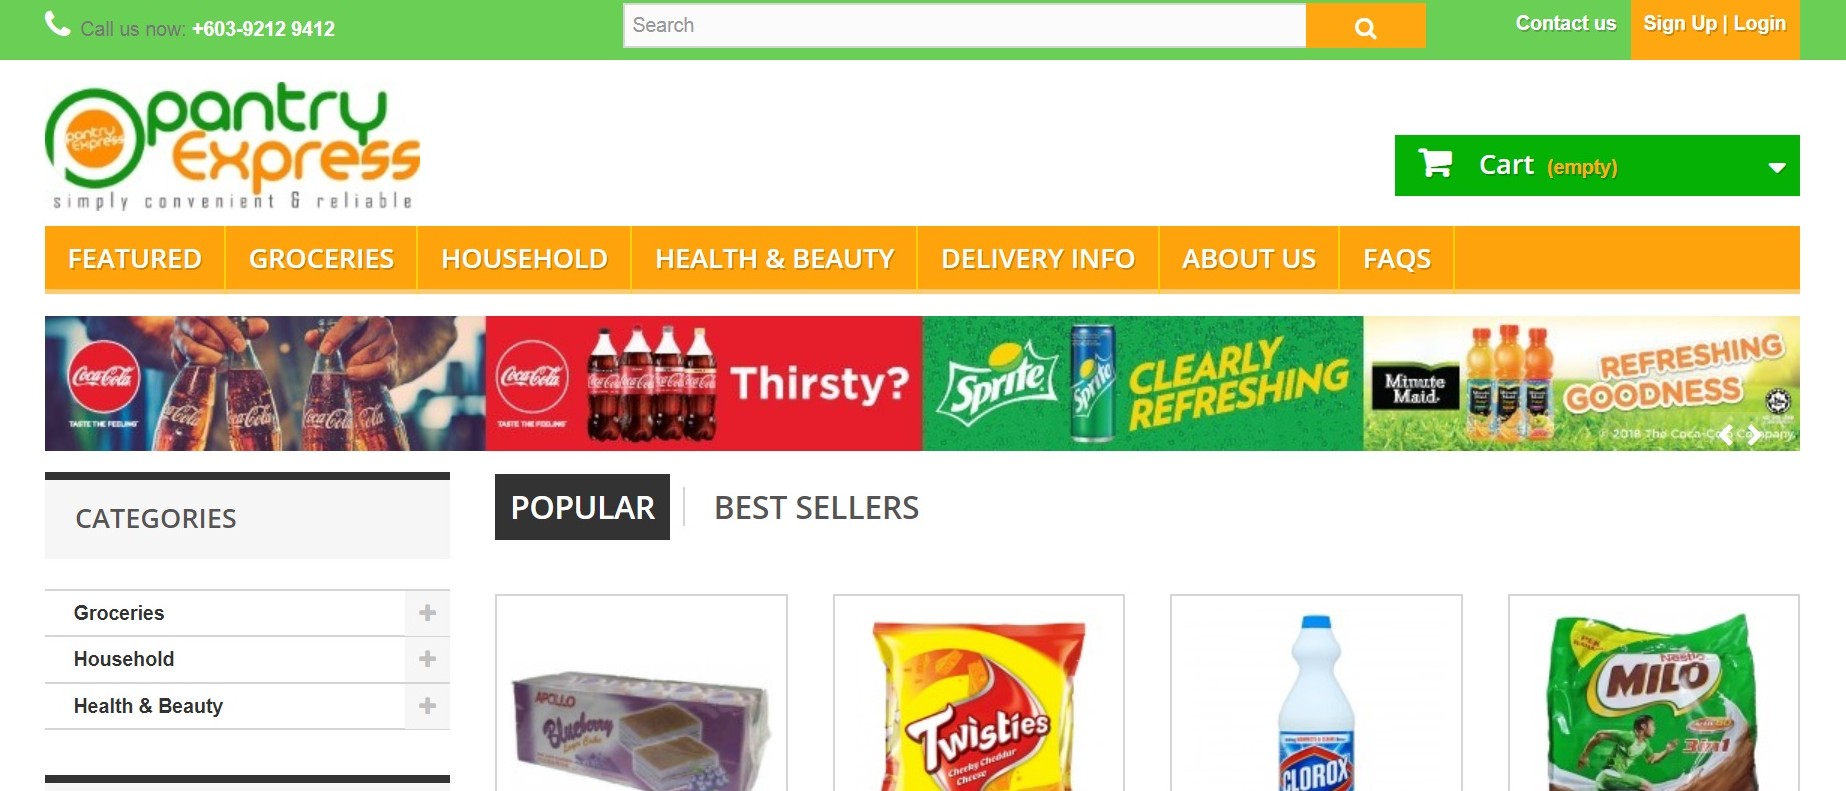 beli barangan runcit online, kedai online, beli barangan runcit secara online